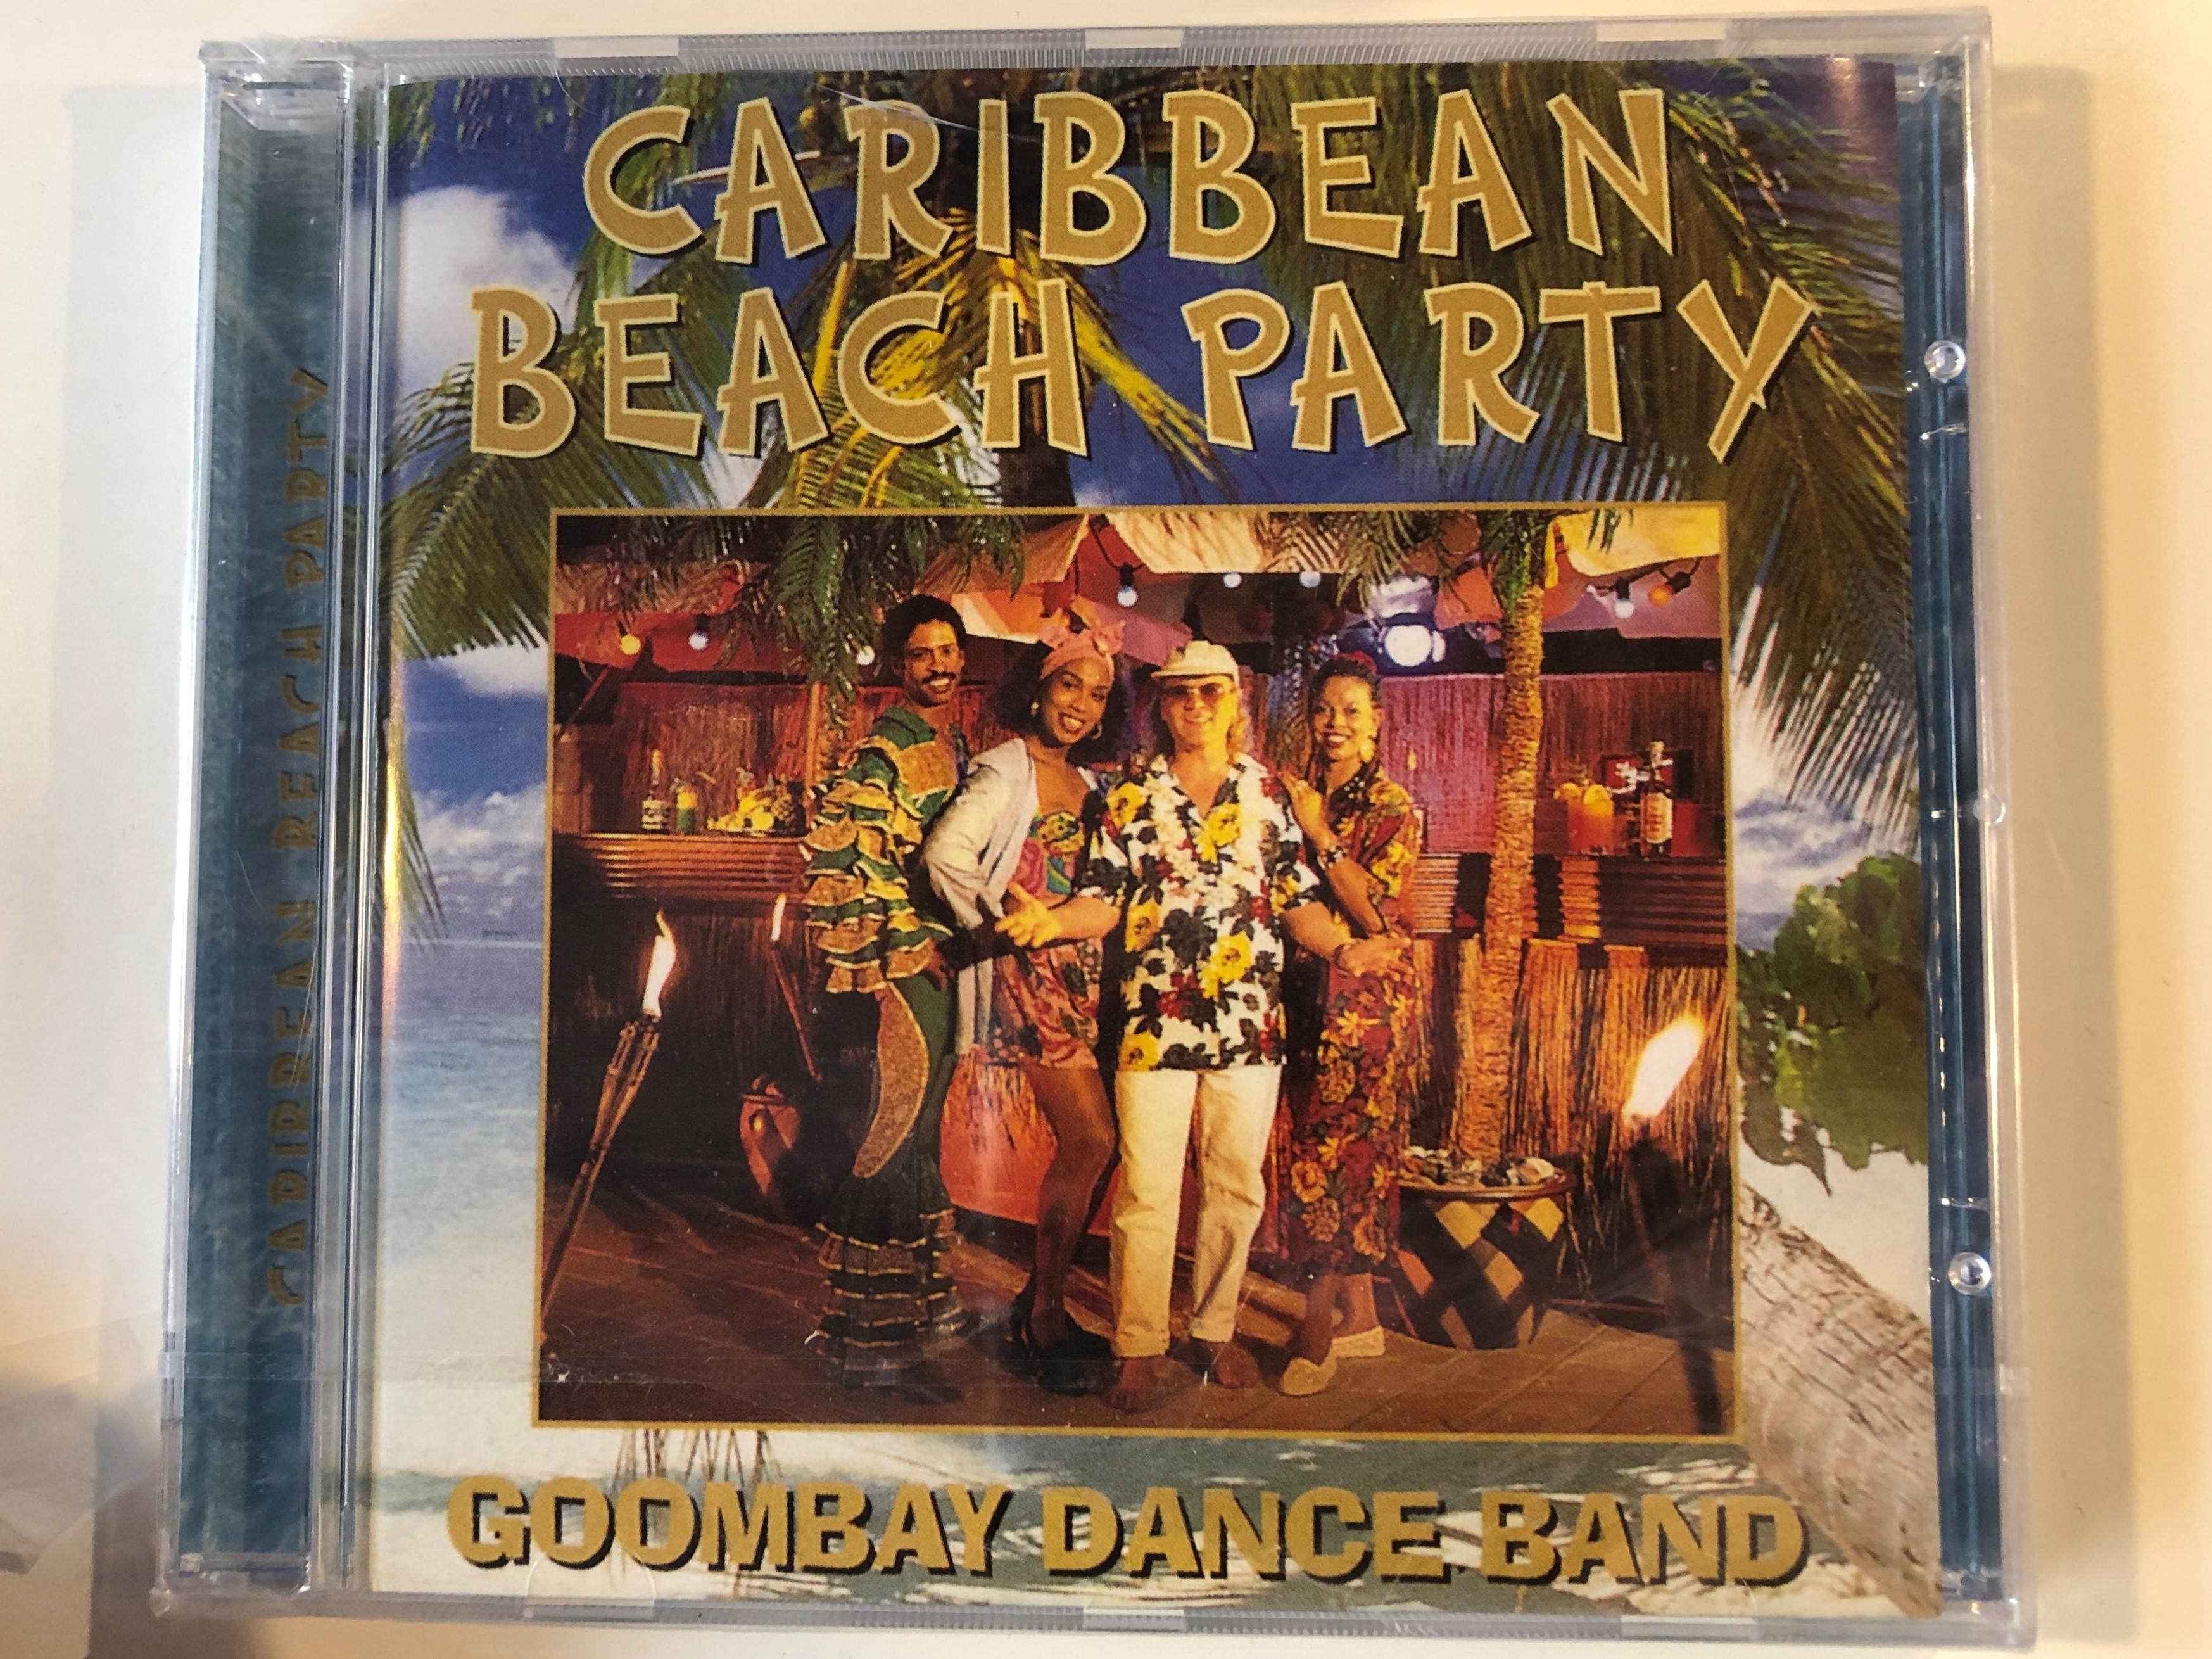 caribbean-beach-party-goombay-dance-band-cmc-value-audio-cd-1995-0724352162628-1-.jpg